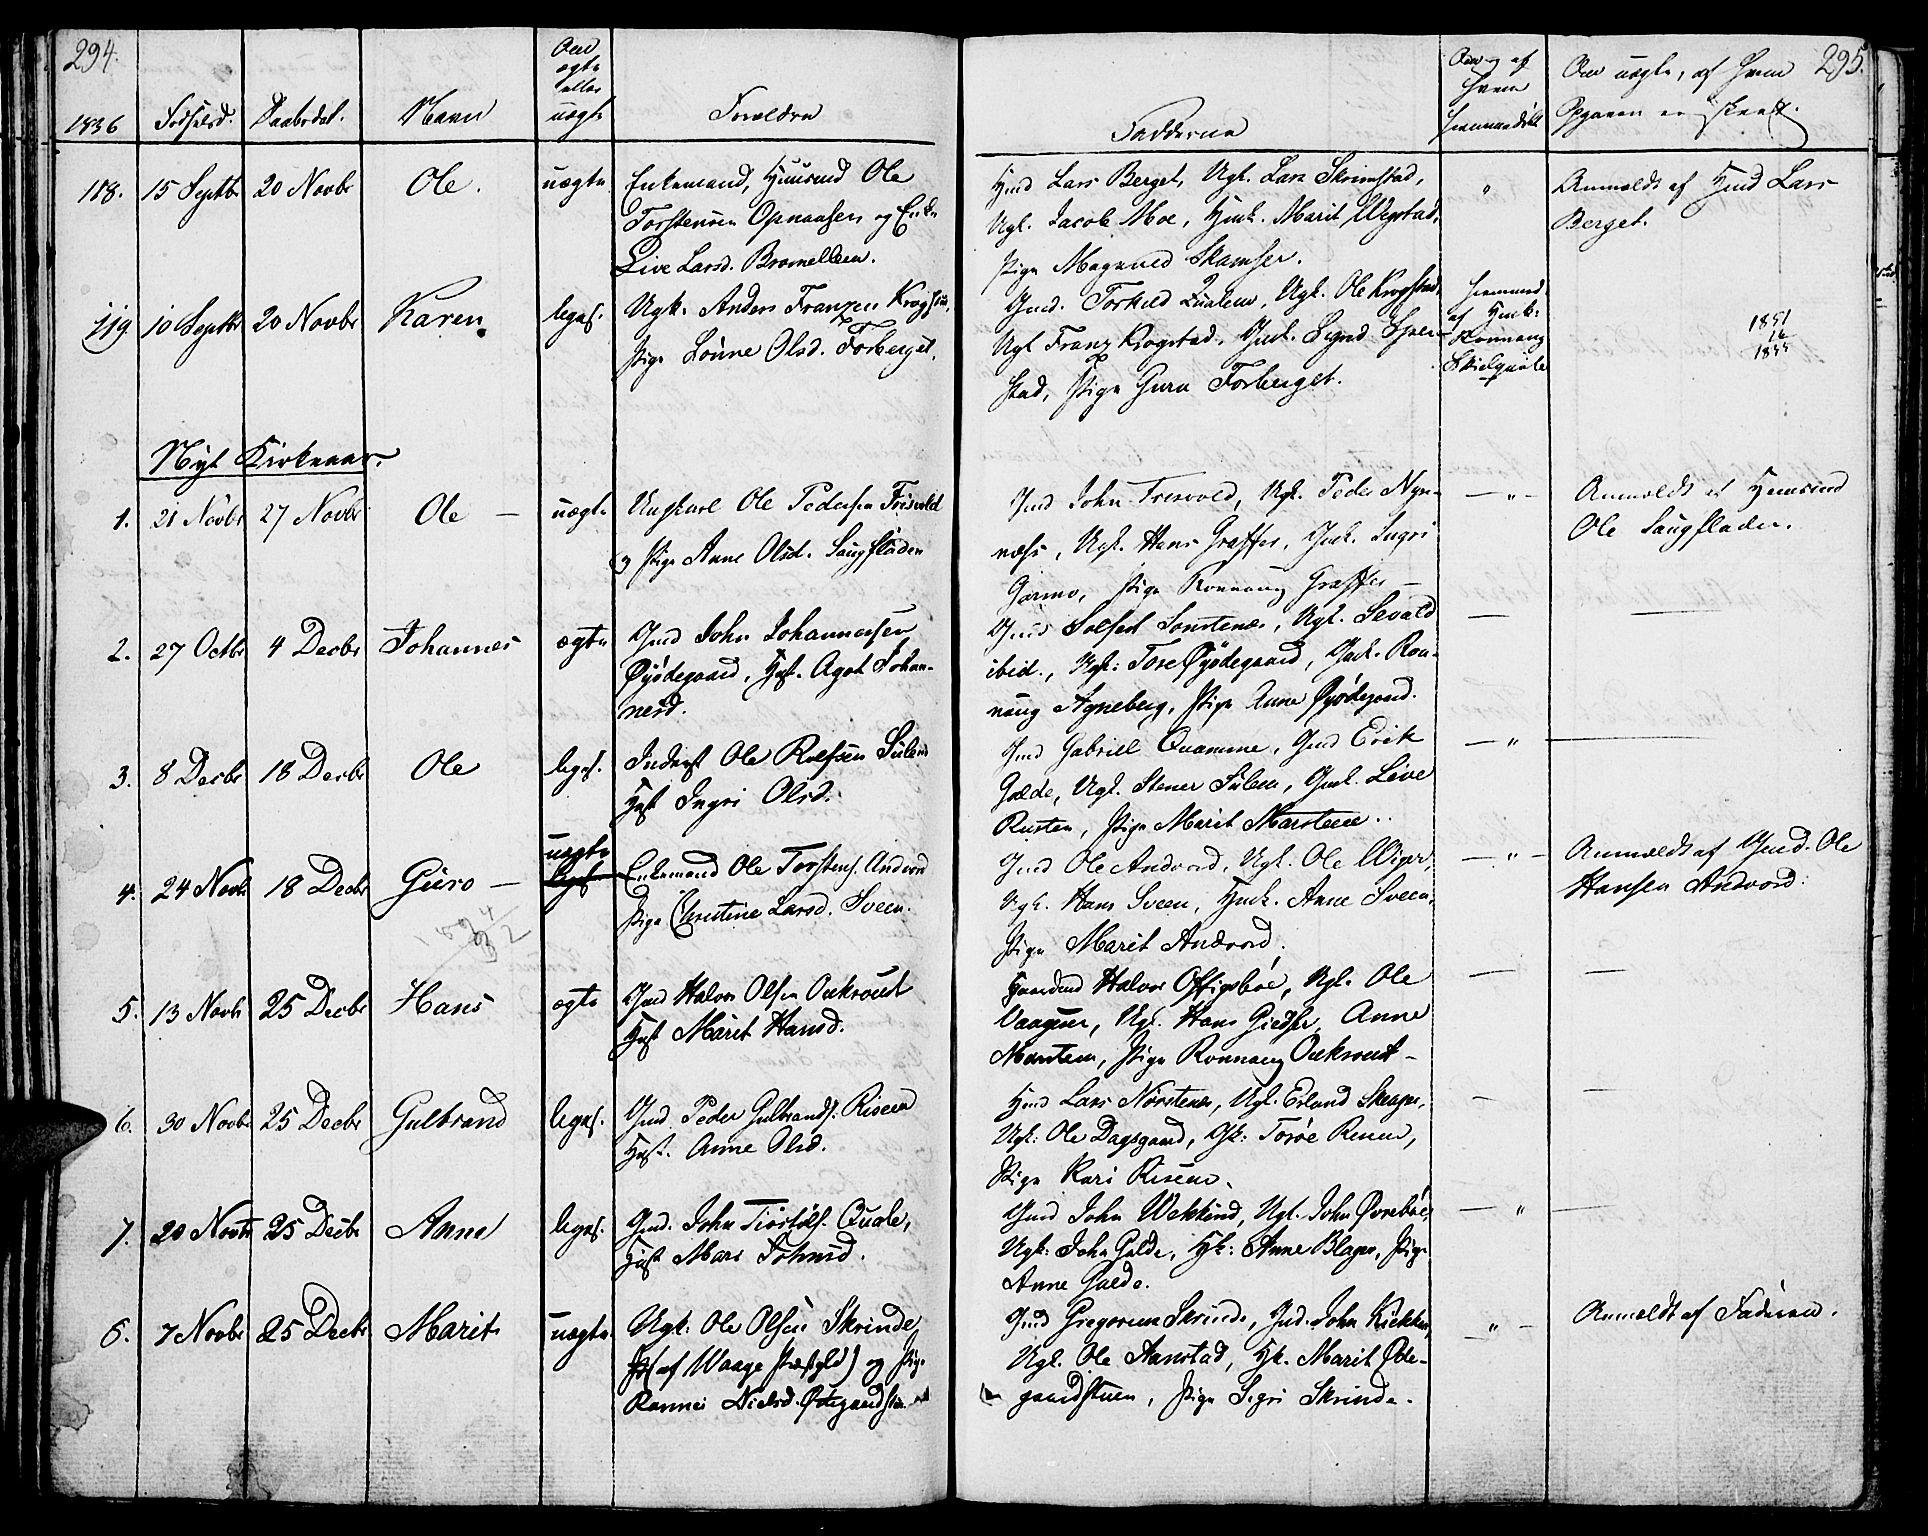 SAH, Lom prestekontor, K/L0005: Parish register (official) no. 5, 1825-1837, p. 294-295